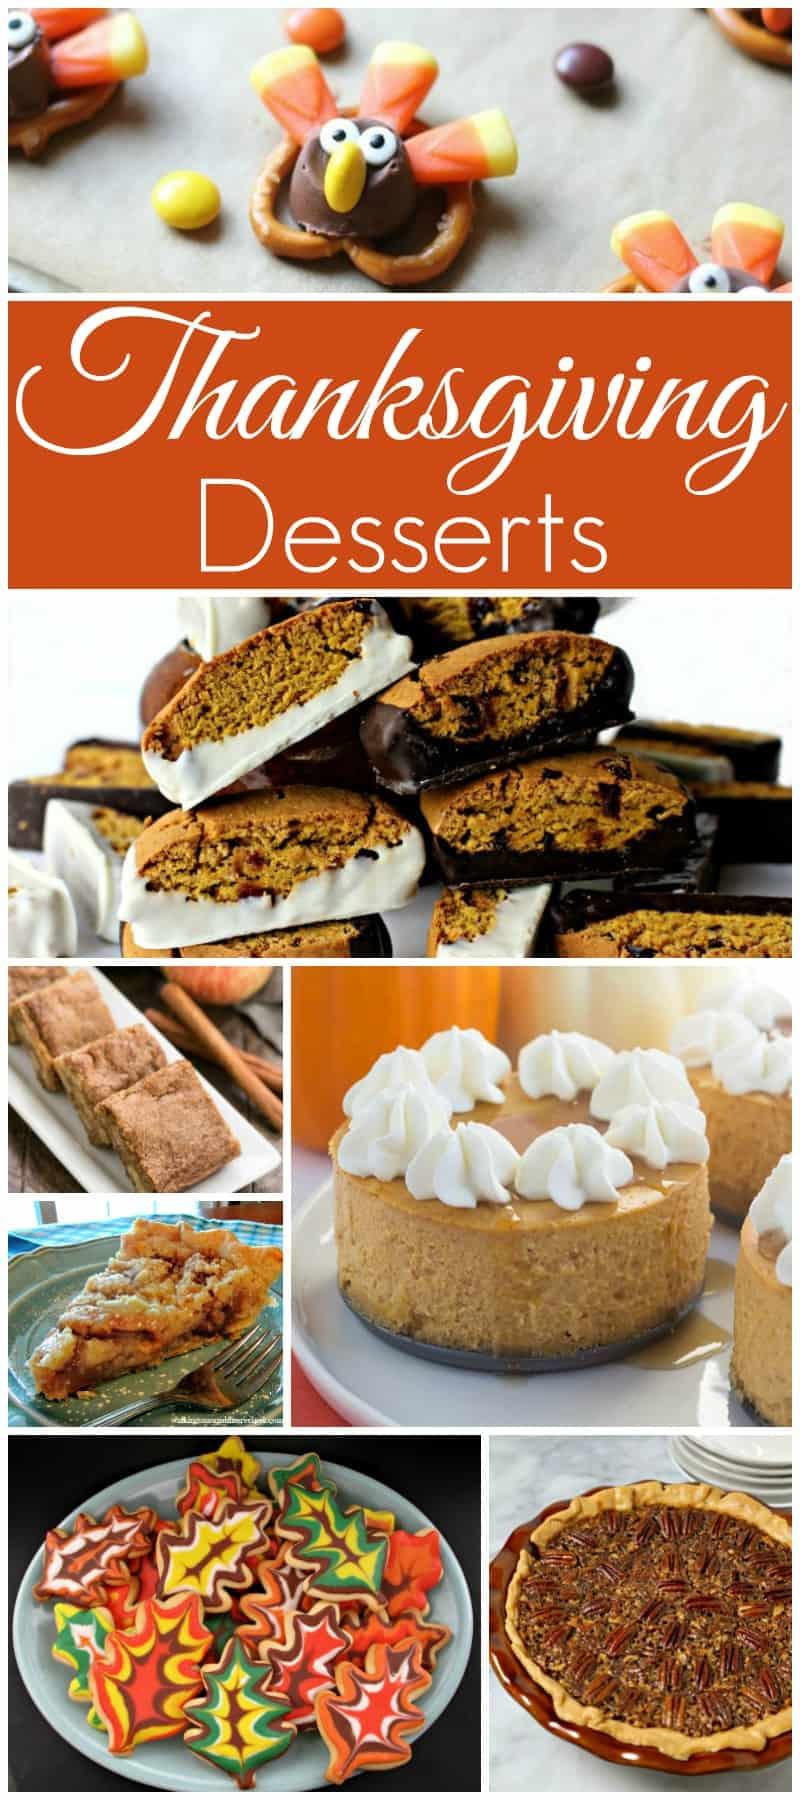 Thanksgiving Desserts - Thanksgiving Dessert Recipes